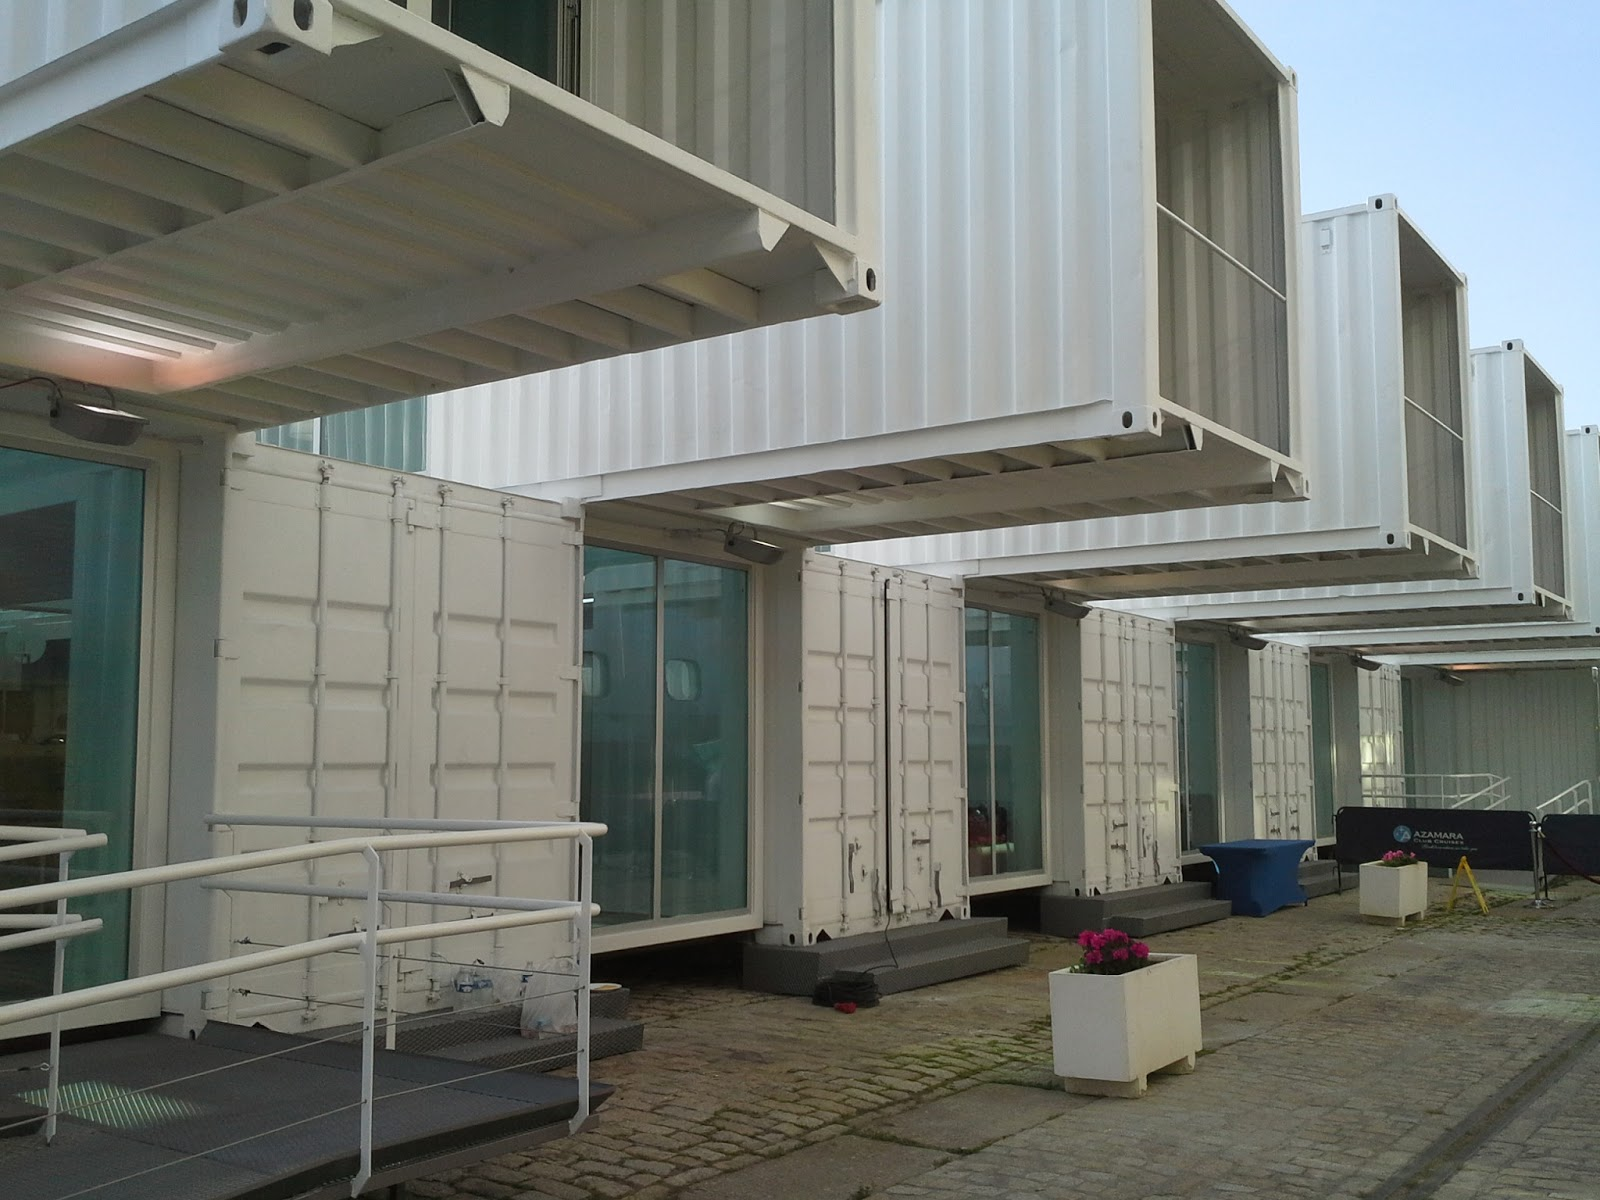 Tercera piel contenedores habitables abril 2013 for Containers habitables